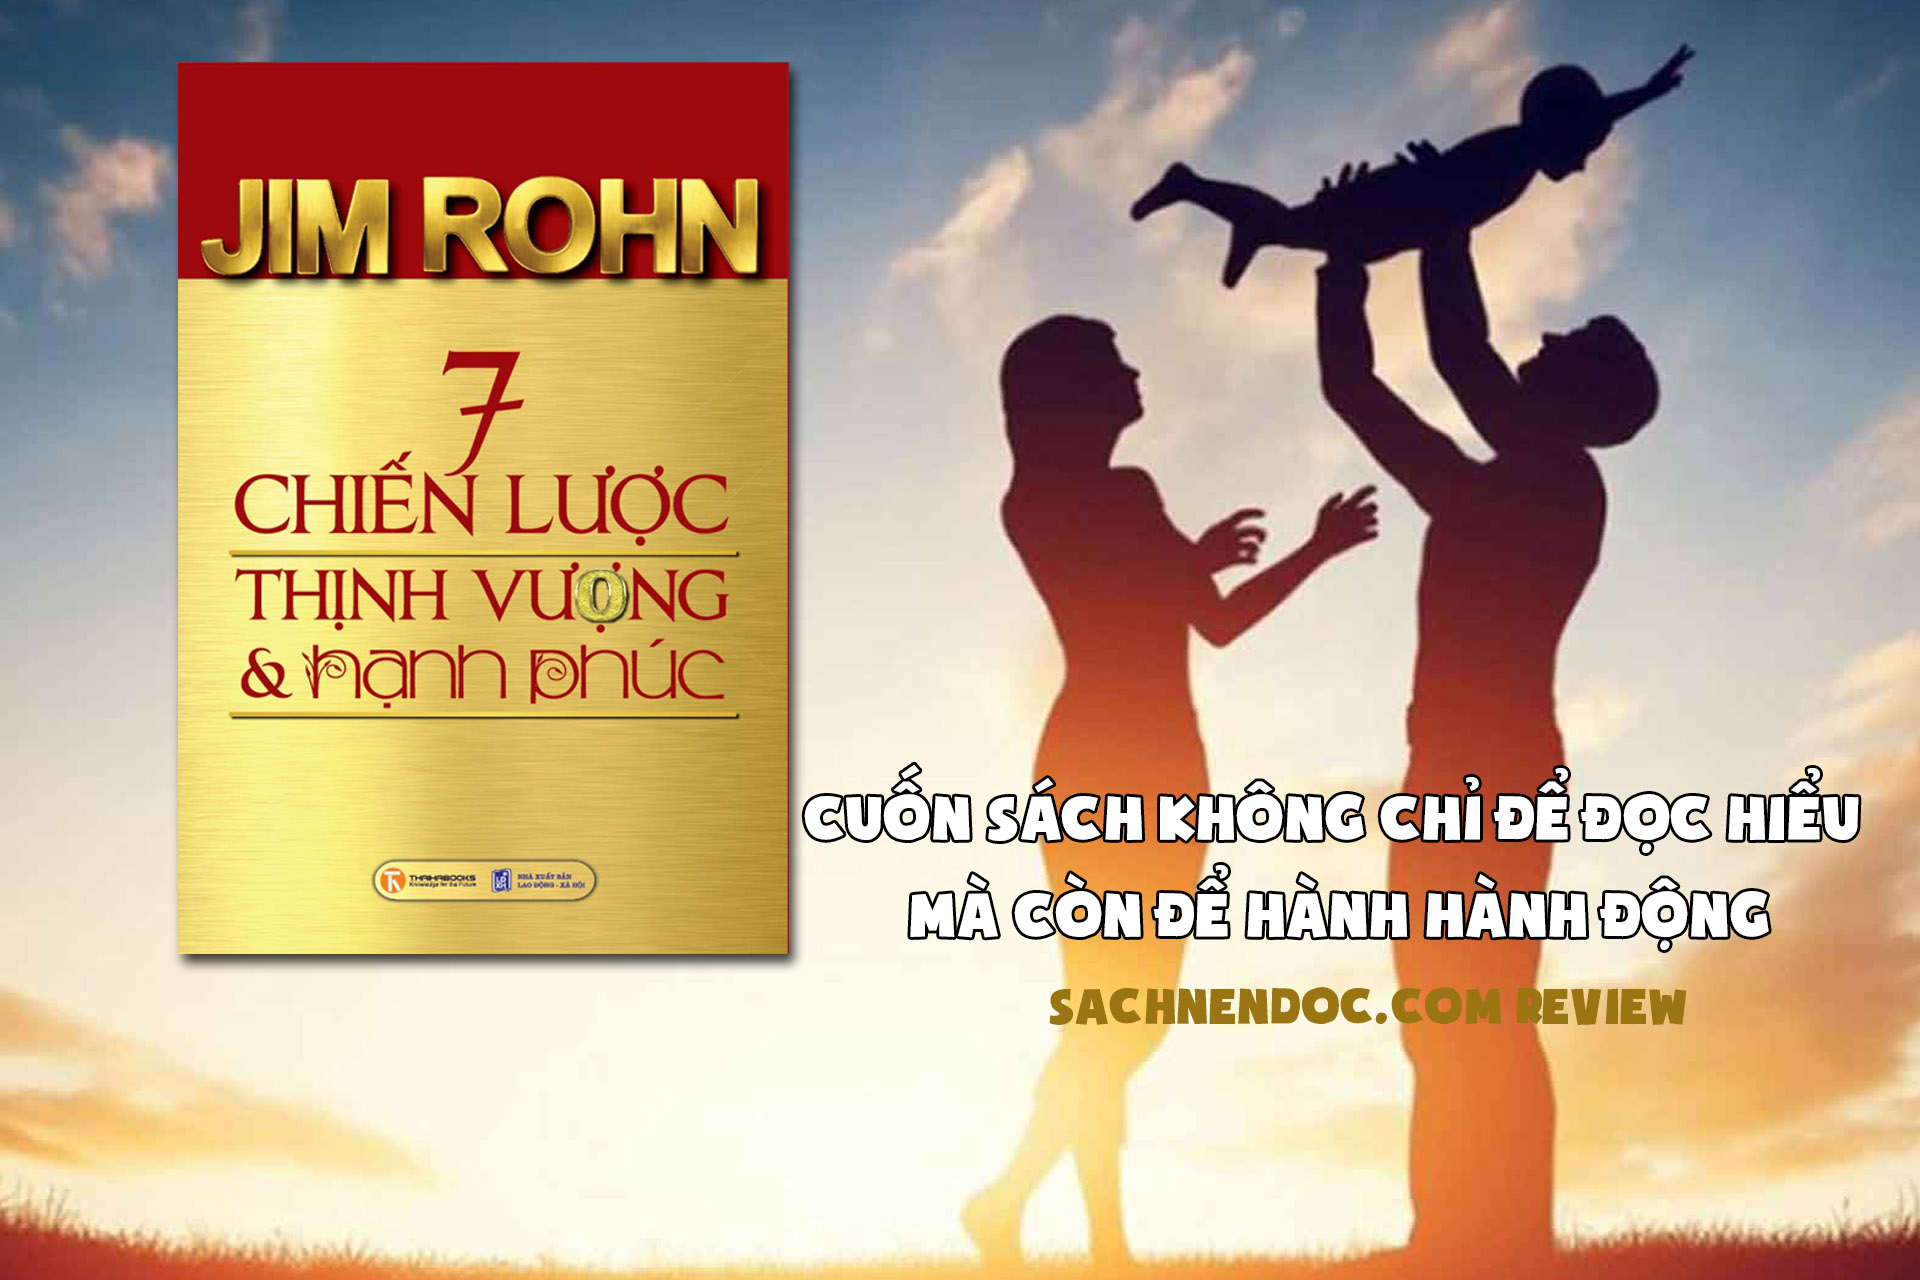 7-chien-luoc-thinh-vuong-va-hanh-phuc-sach-nen-doc-review-sach